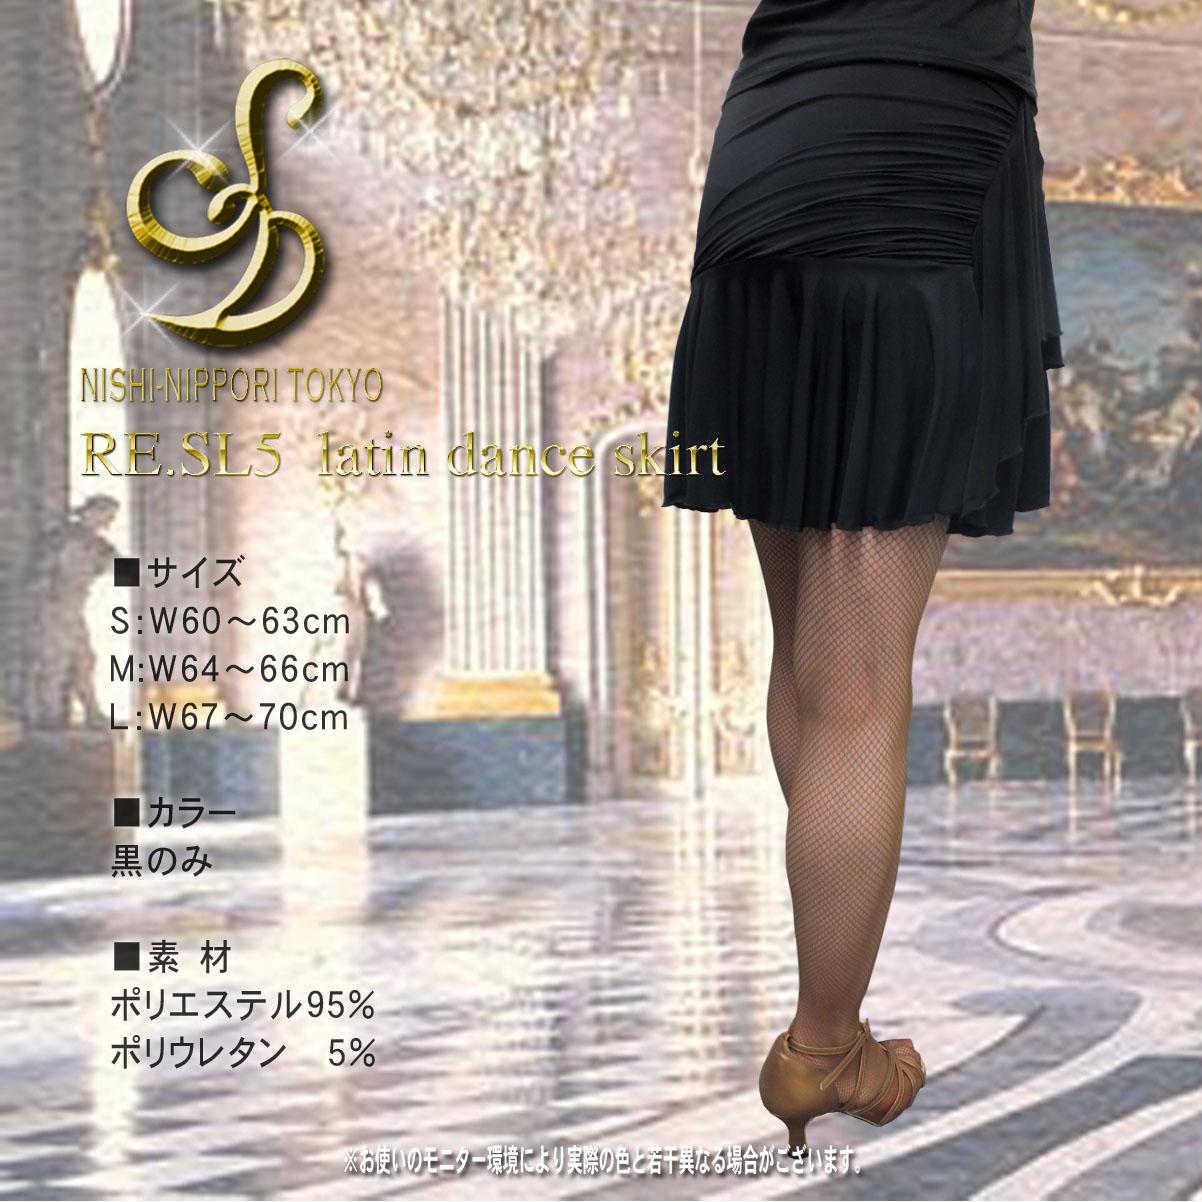 RE.SL5 ラテンスカート002